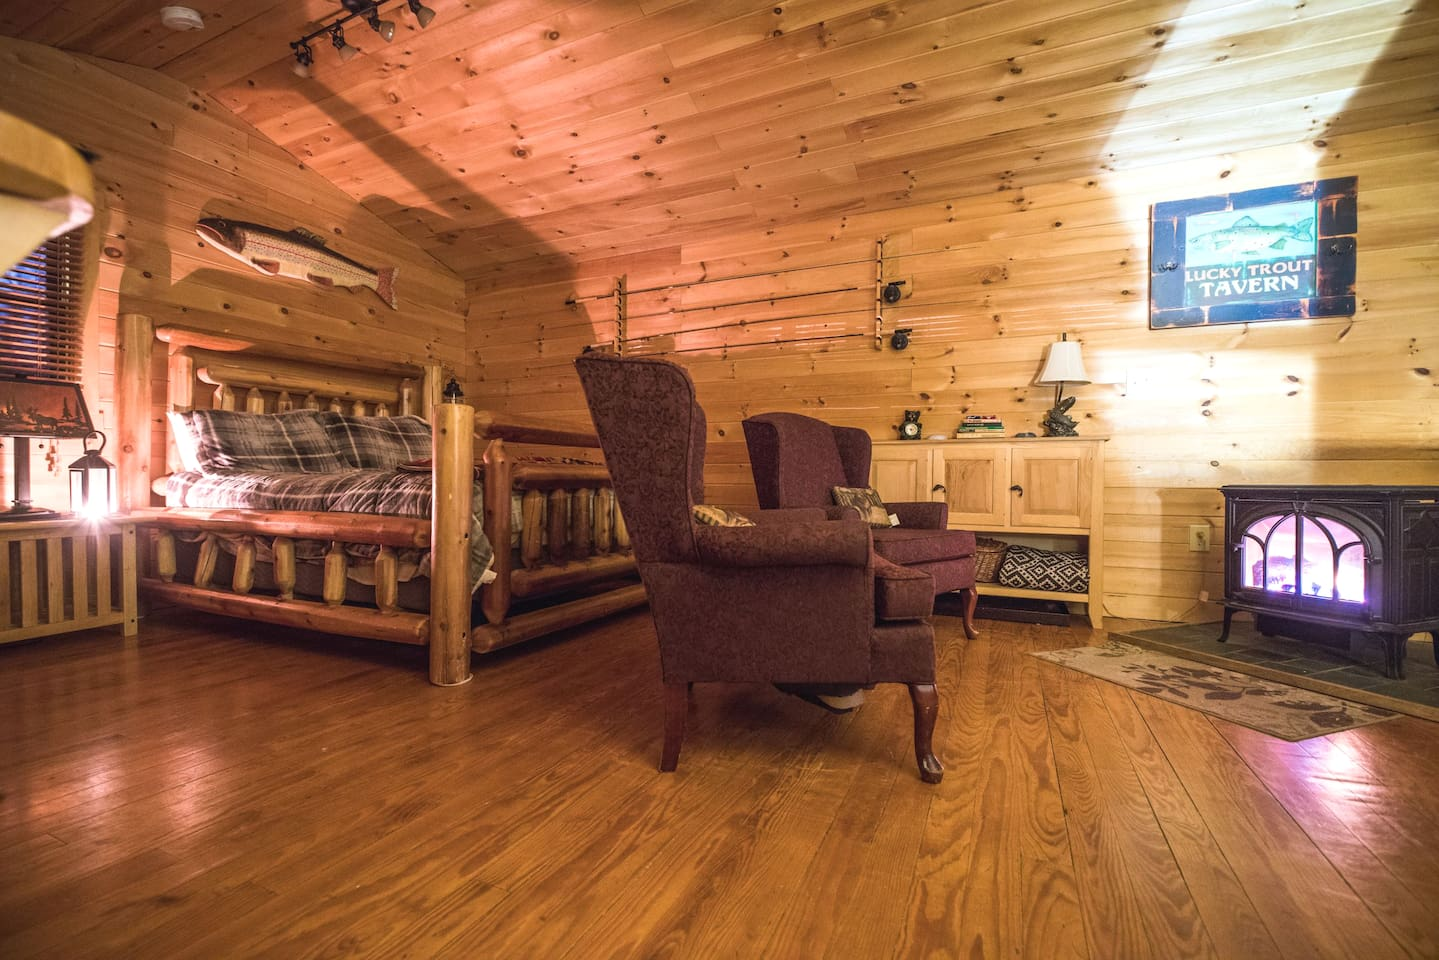 COZY, propane fire place, sitting area, HD SMART TV, well lit, open